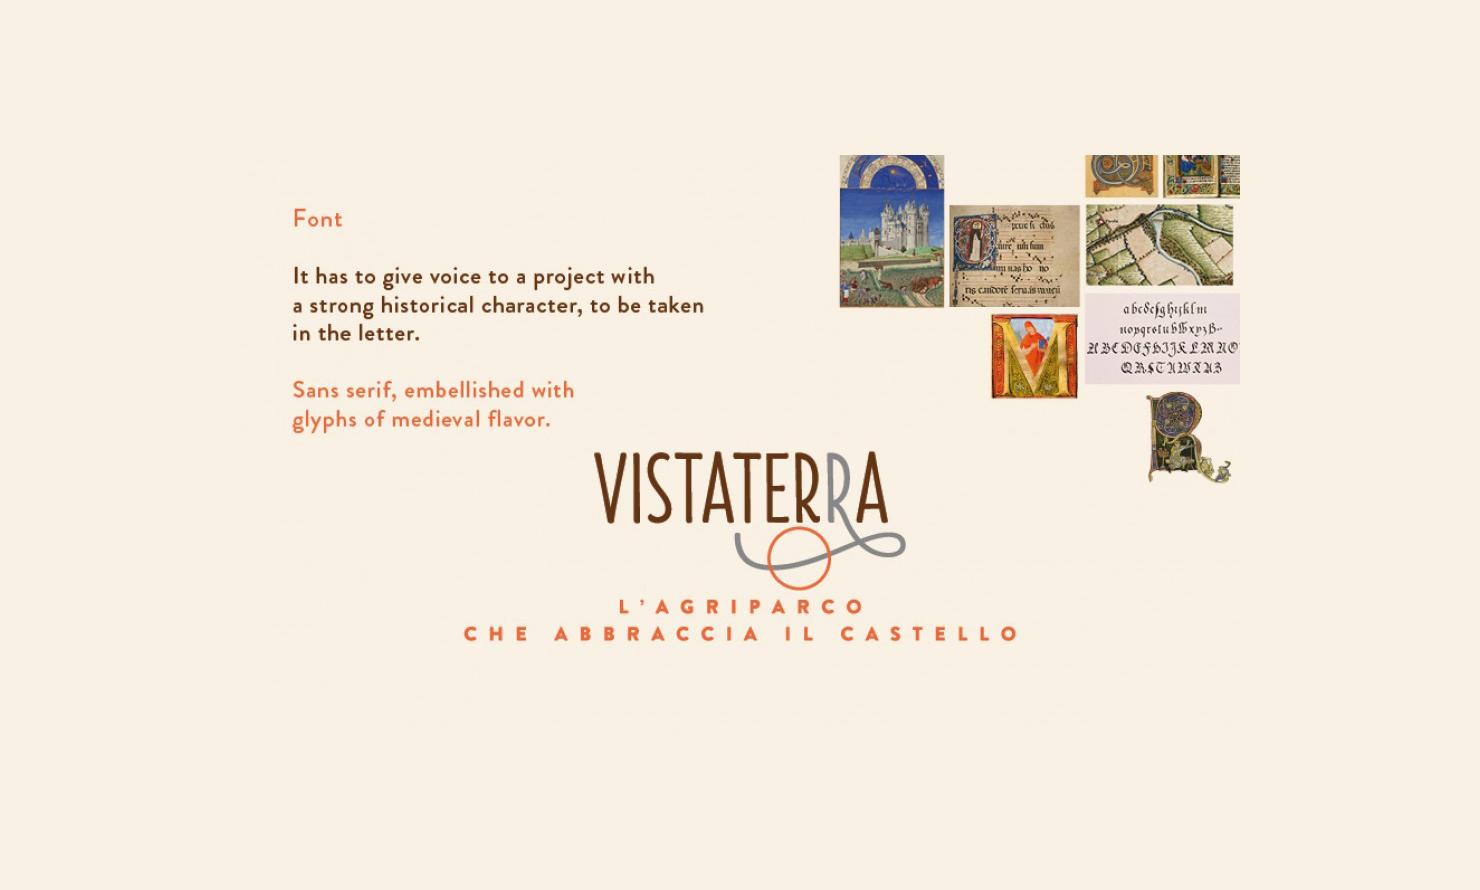 https://www.kubelibre.com/uploads/Slider-work-tutti-clienti/manital-vistaterra-l-agriparco-che-abbraccia-il-castello-brand-identity-brand-strategy-6.jpg